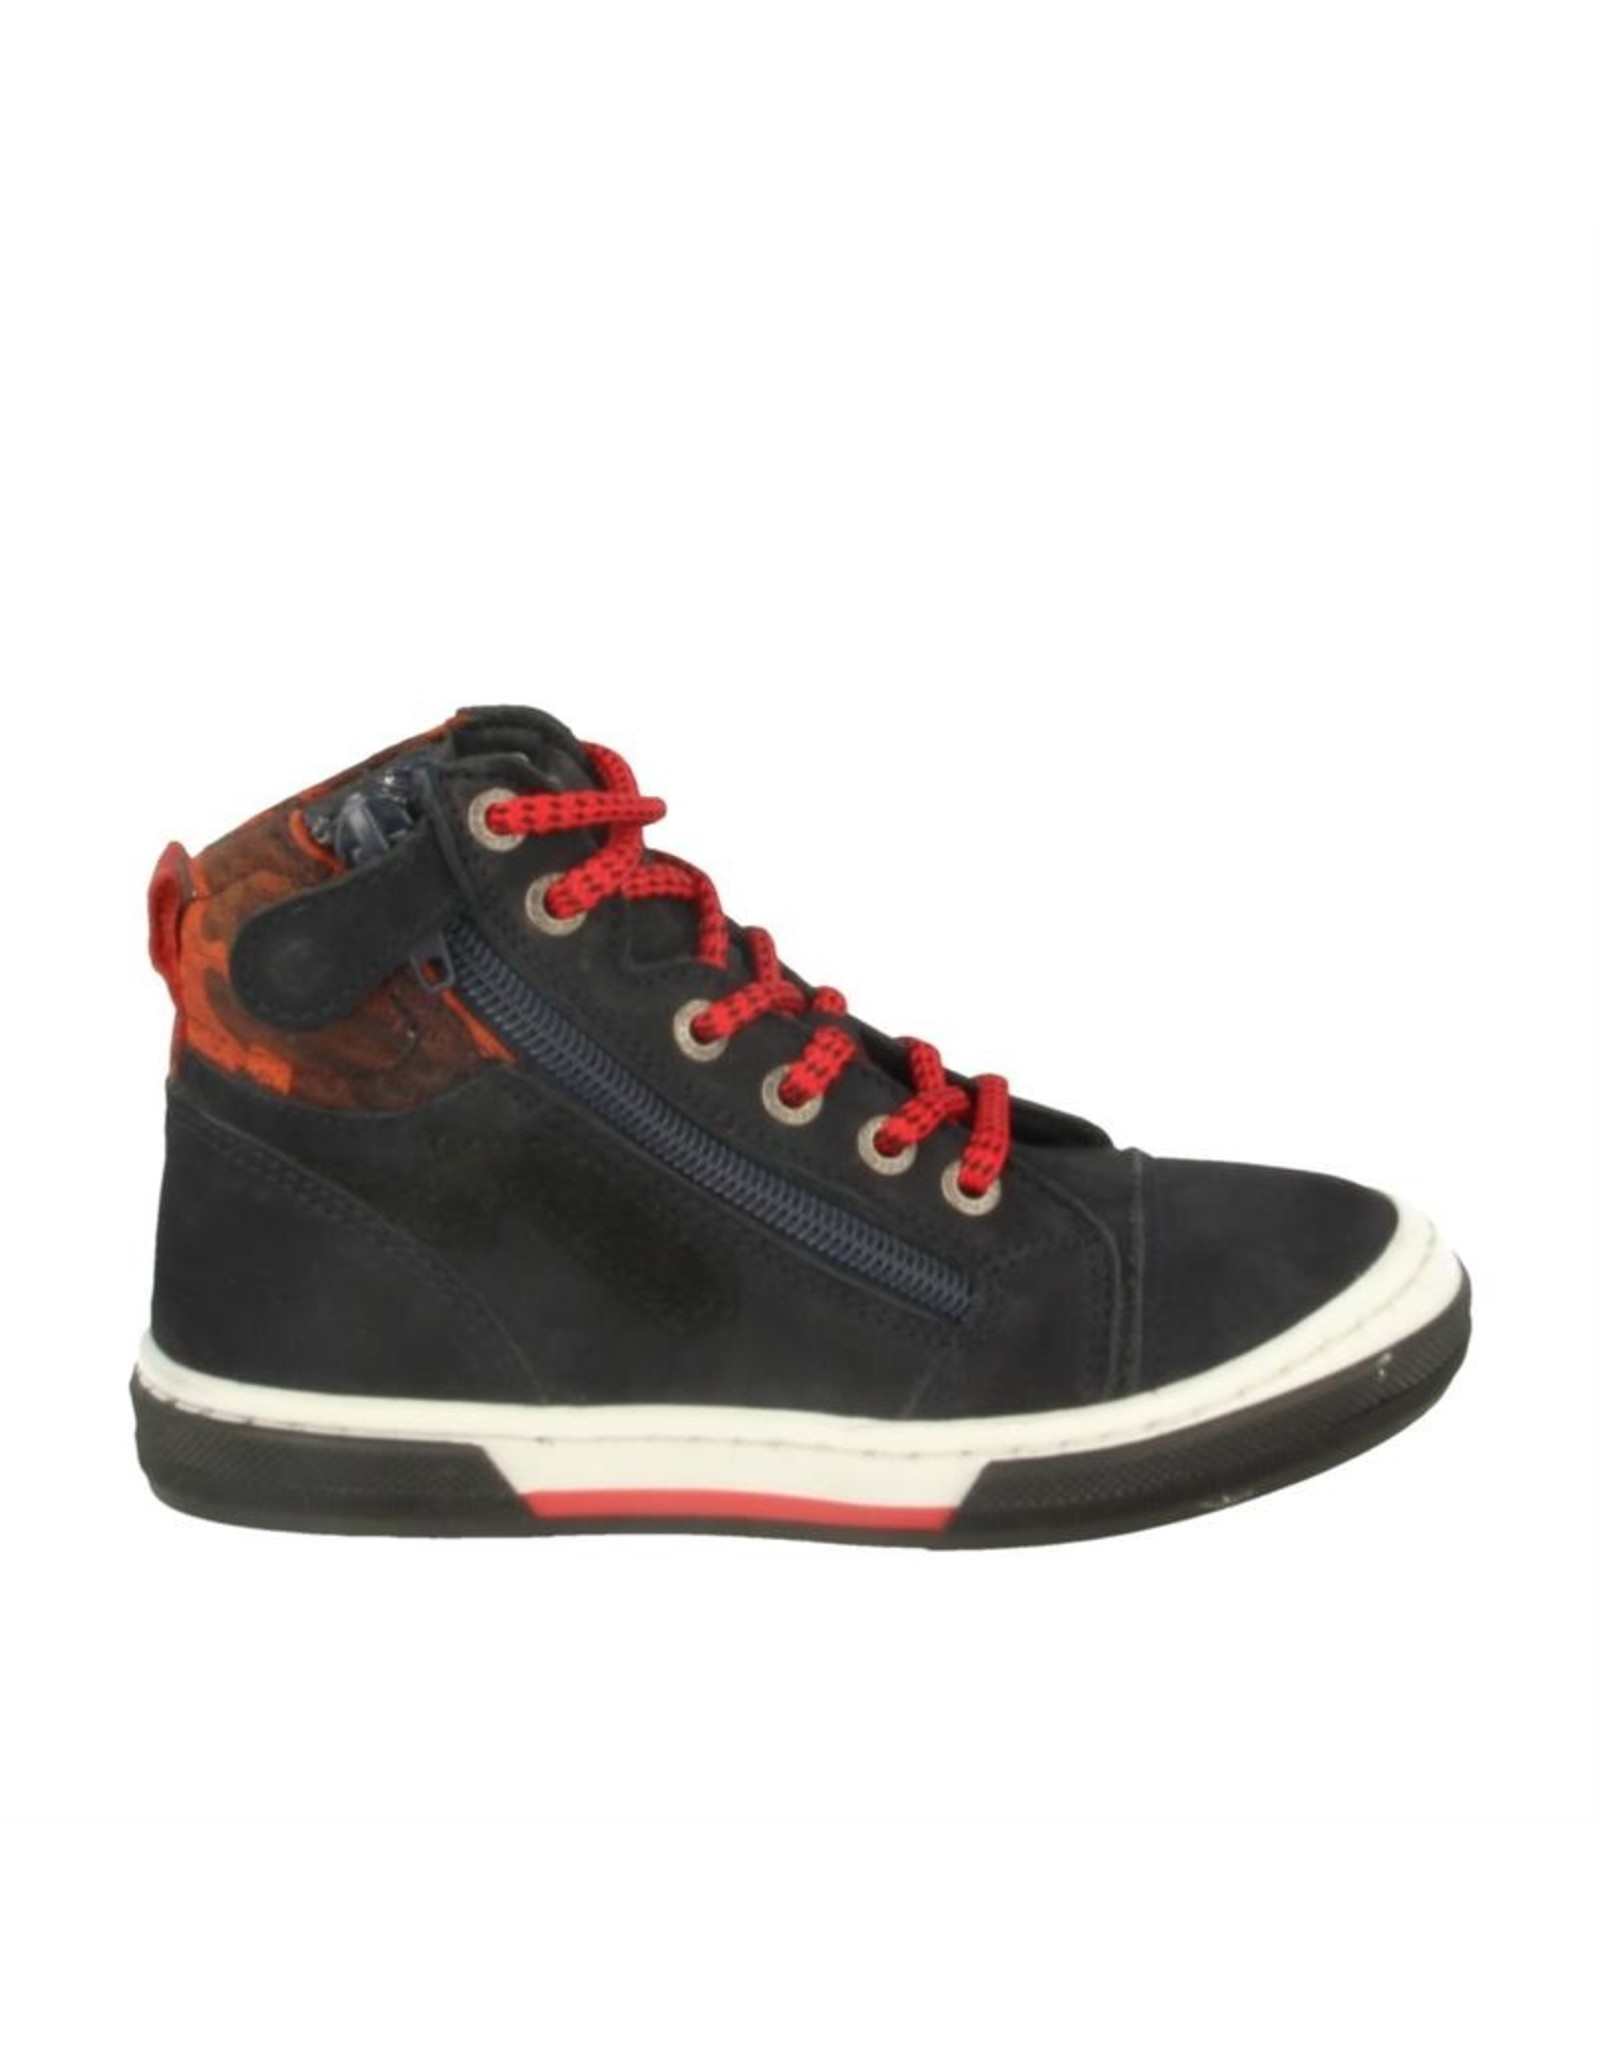 Piedro Piedro - Half hoge schoen donkerblauw